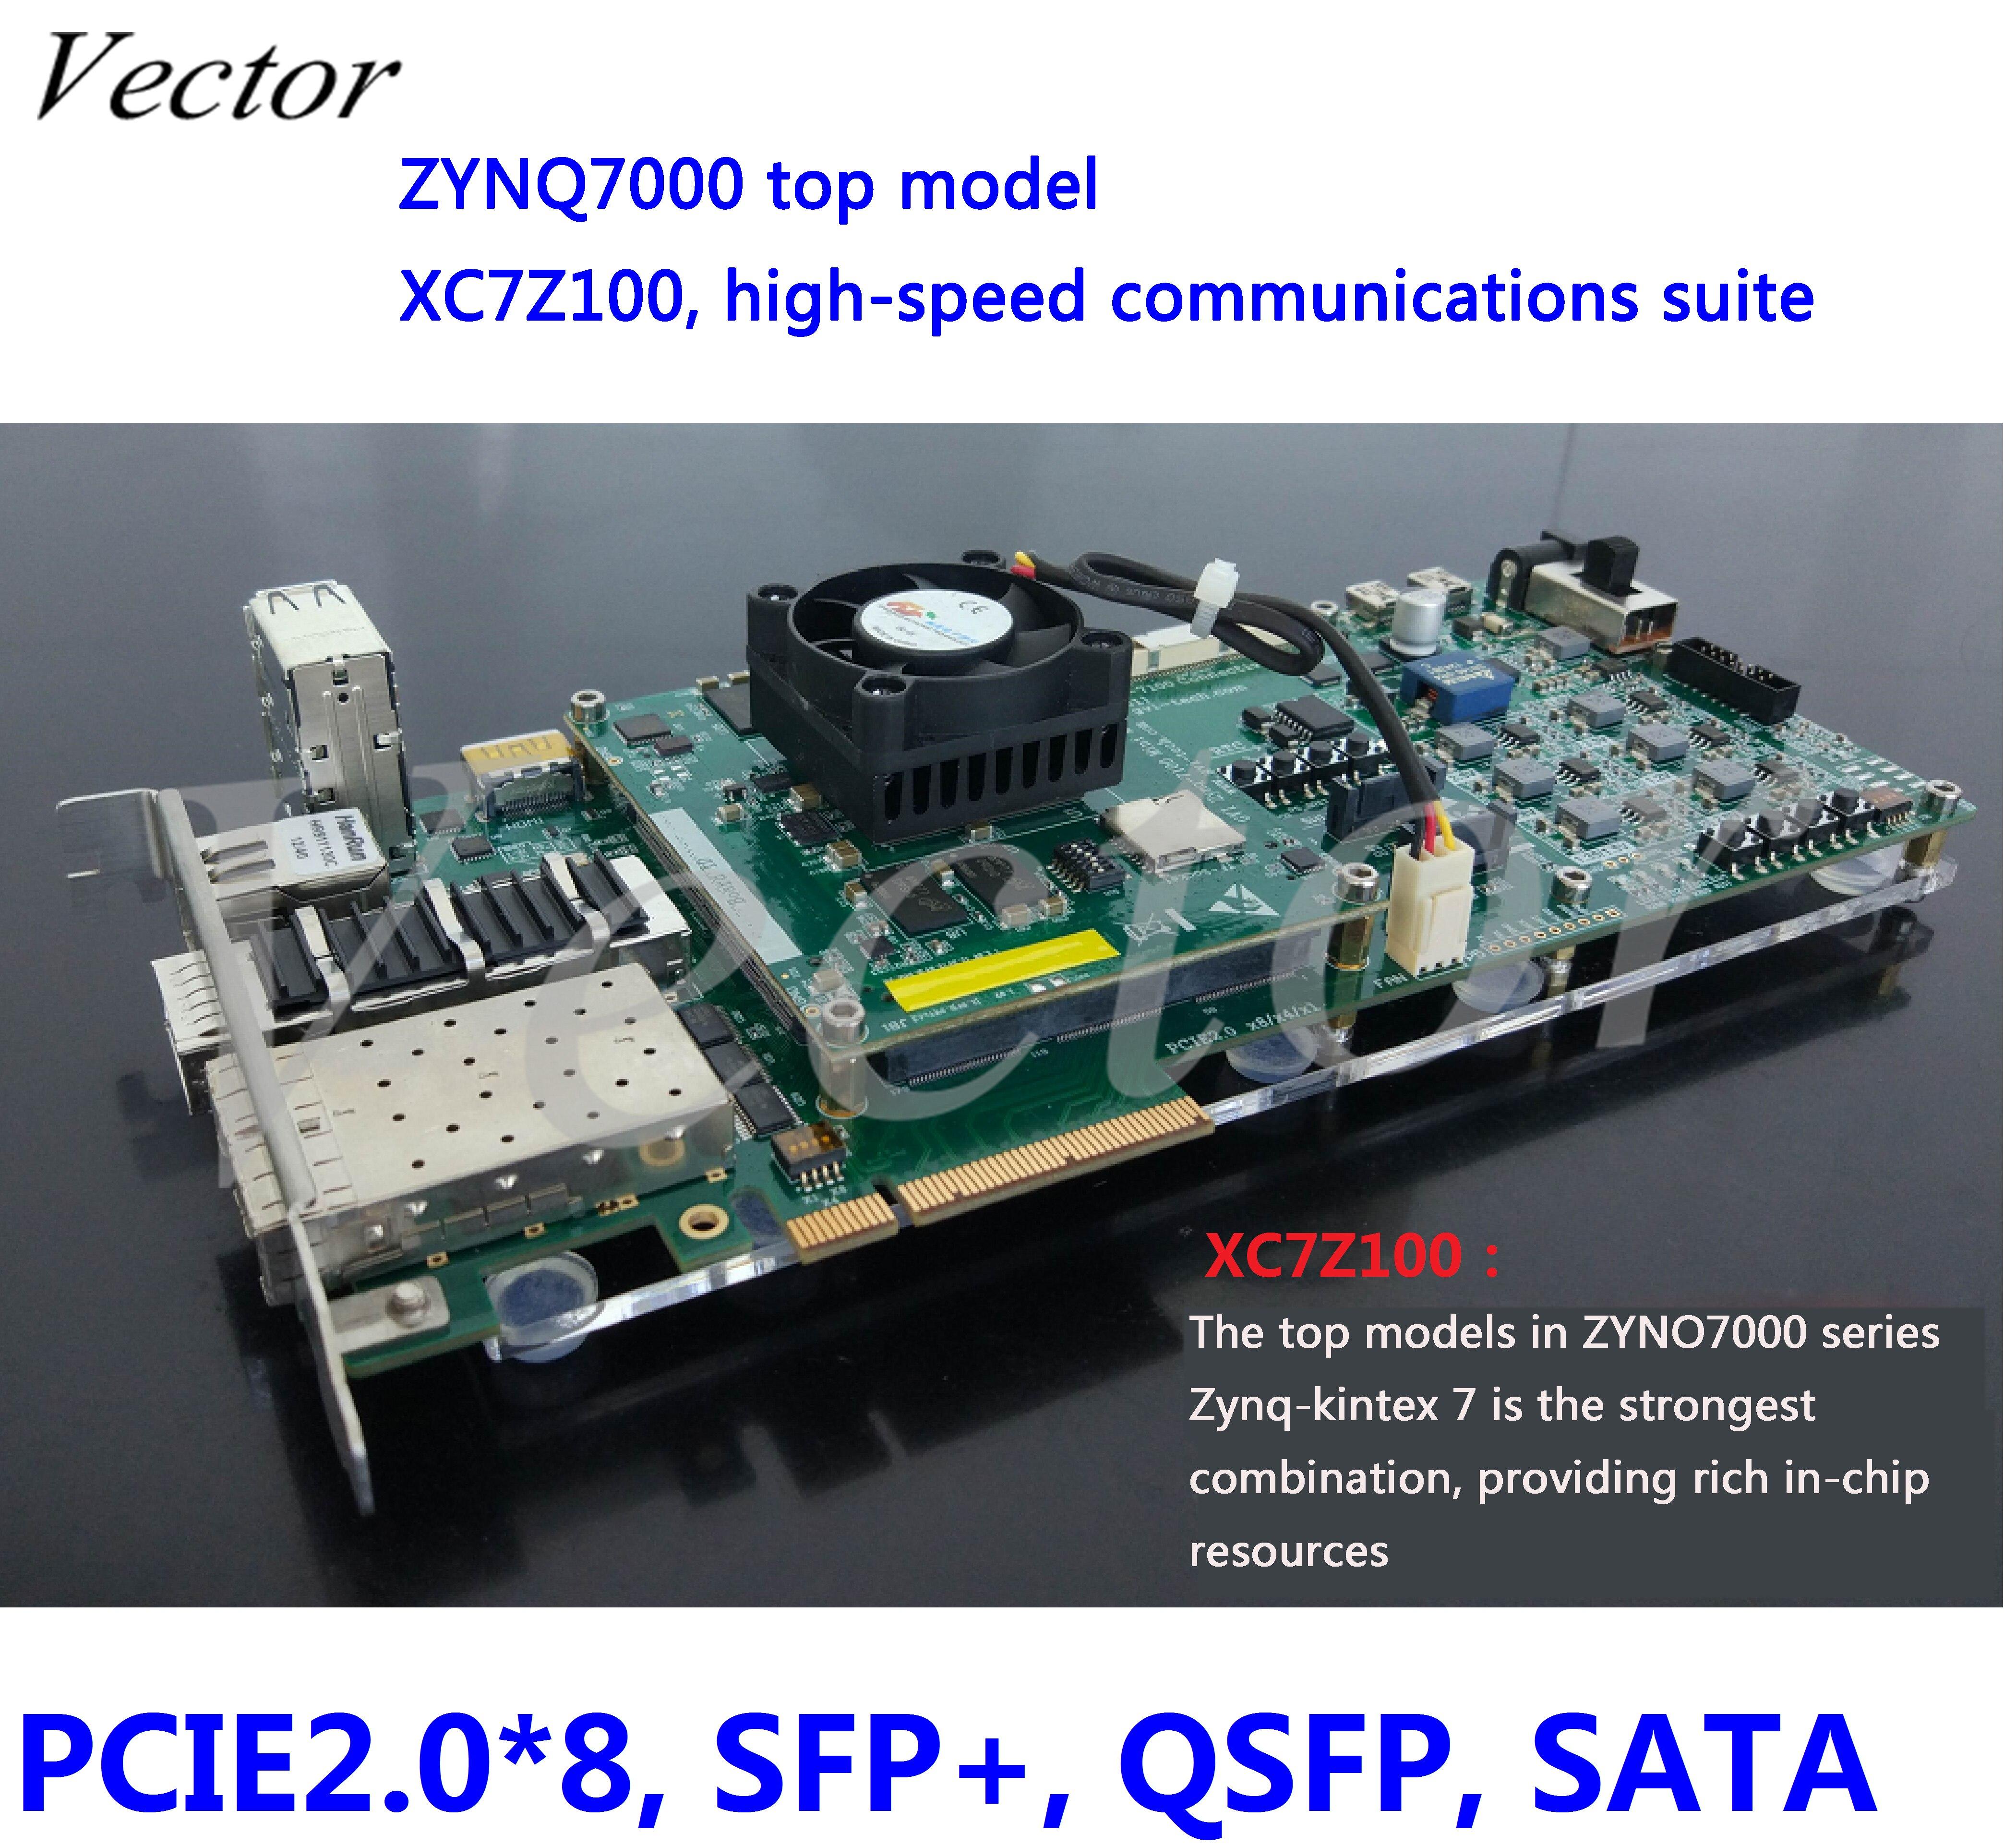 ZYNQ7000 core board ,ZYNQ,Kintex-7 development board, XC7Z100,Sata, PCIe, 10G ethernet network(China)